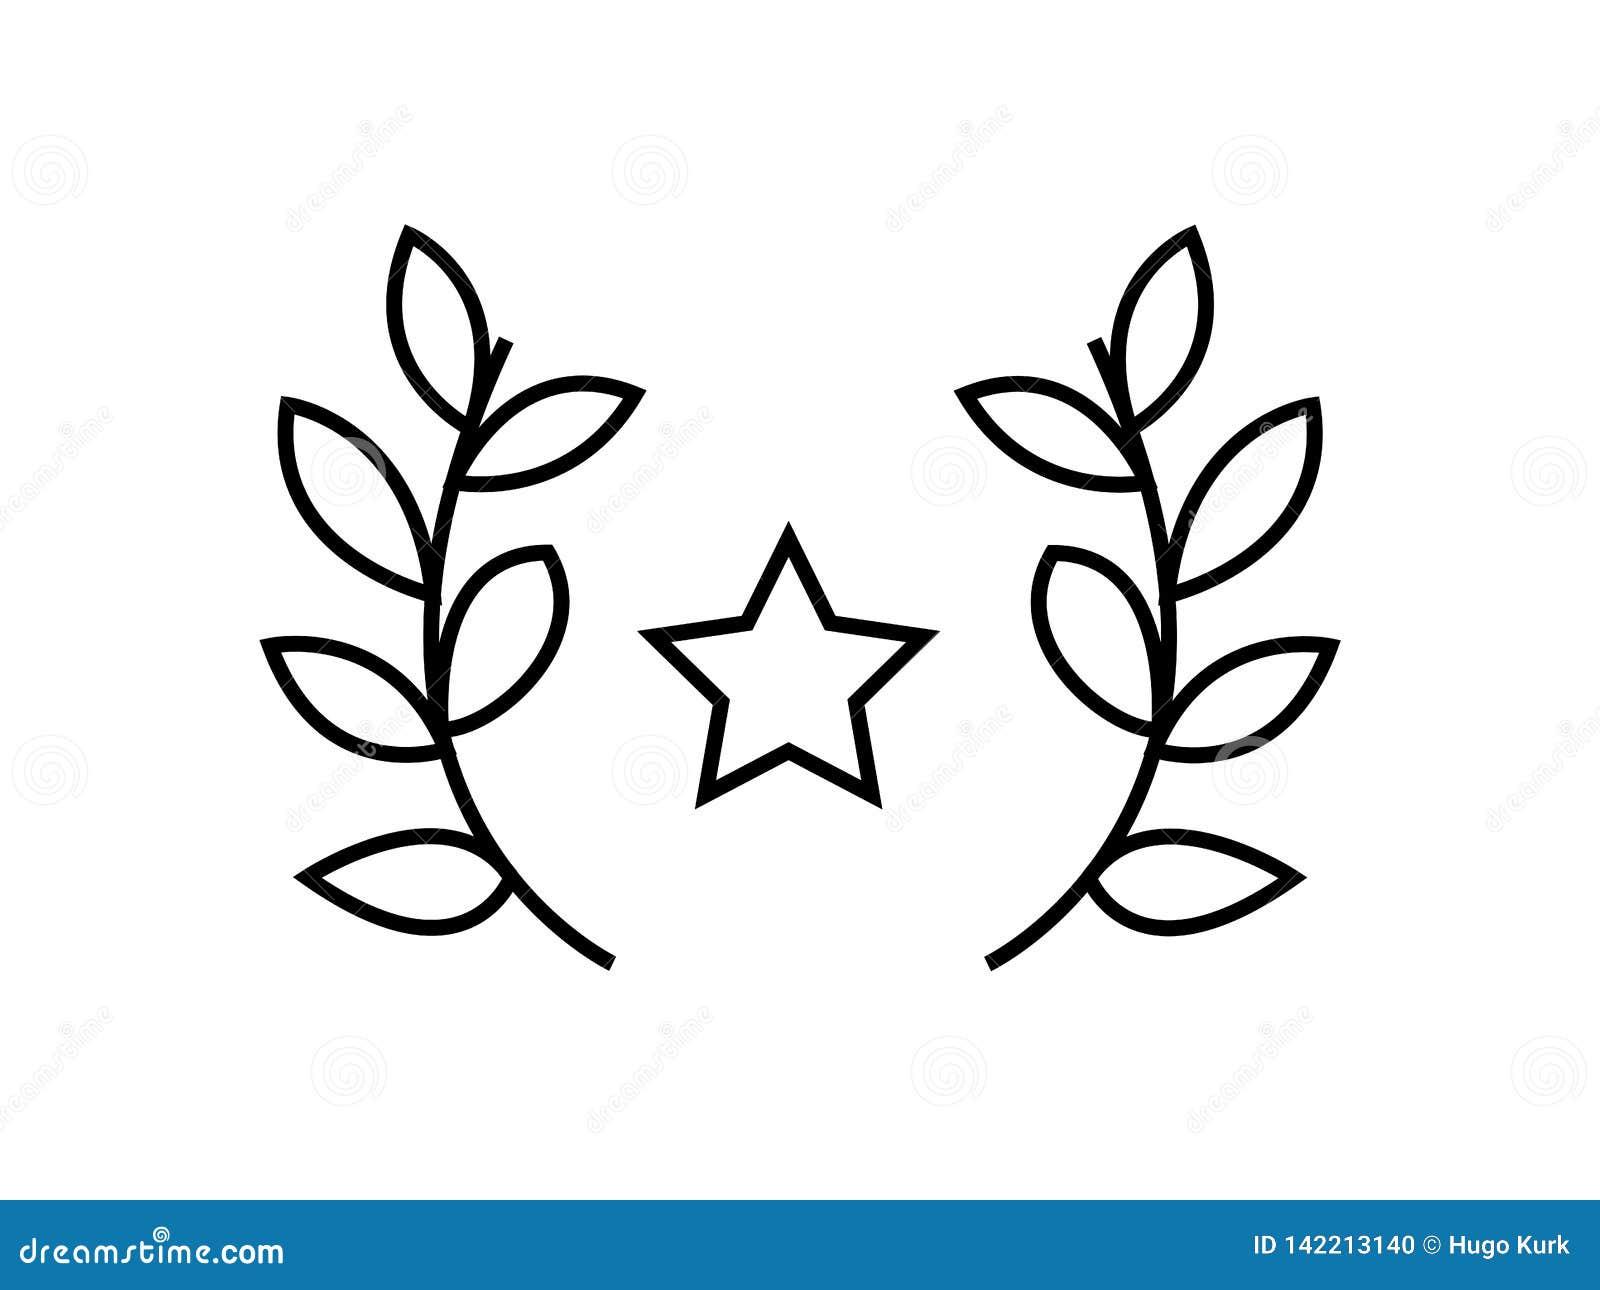 Star prize leaves symbol